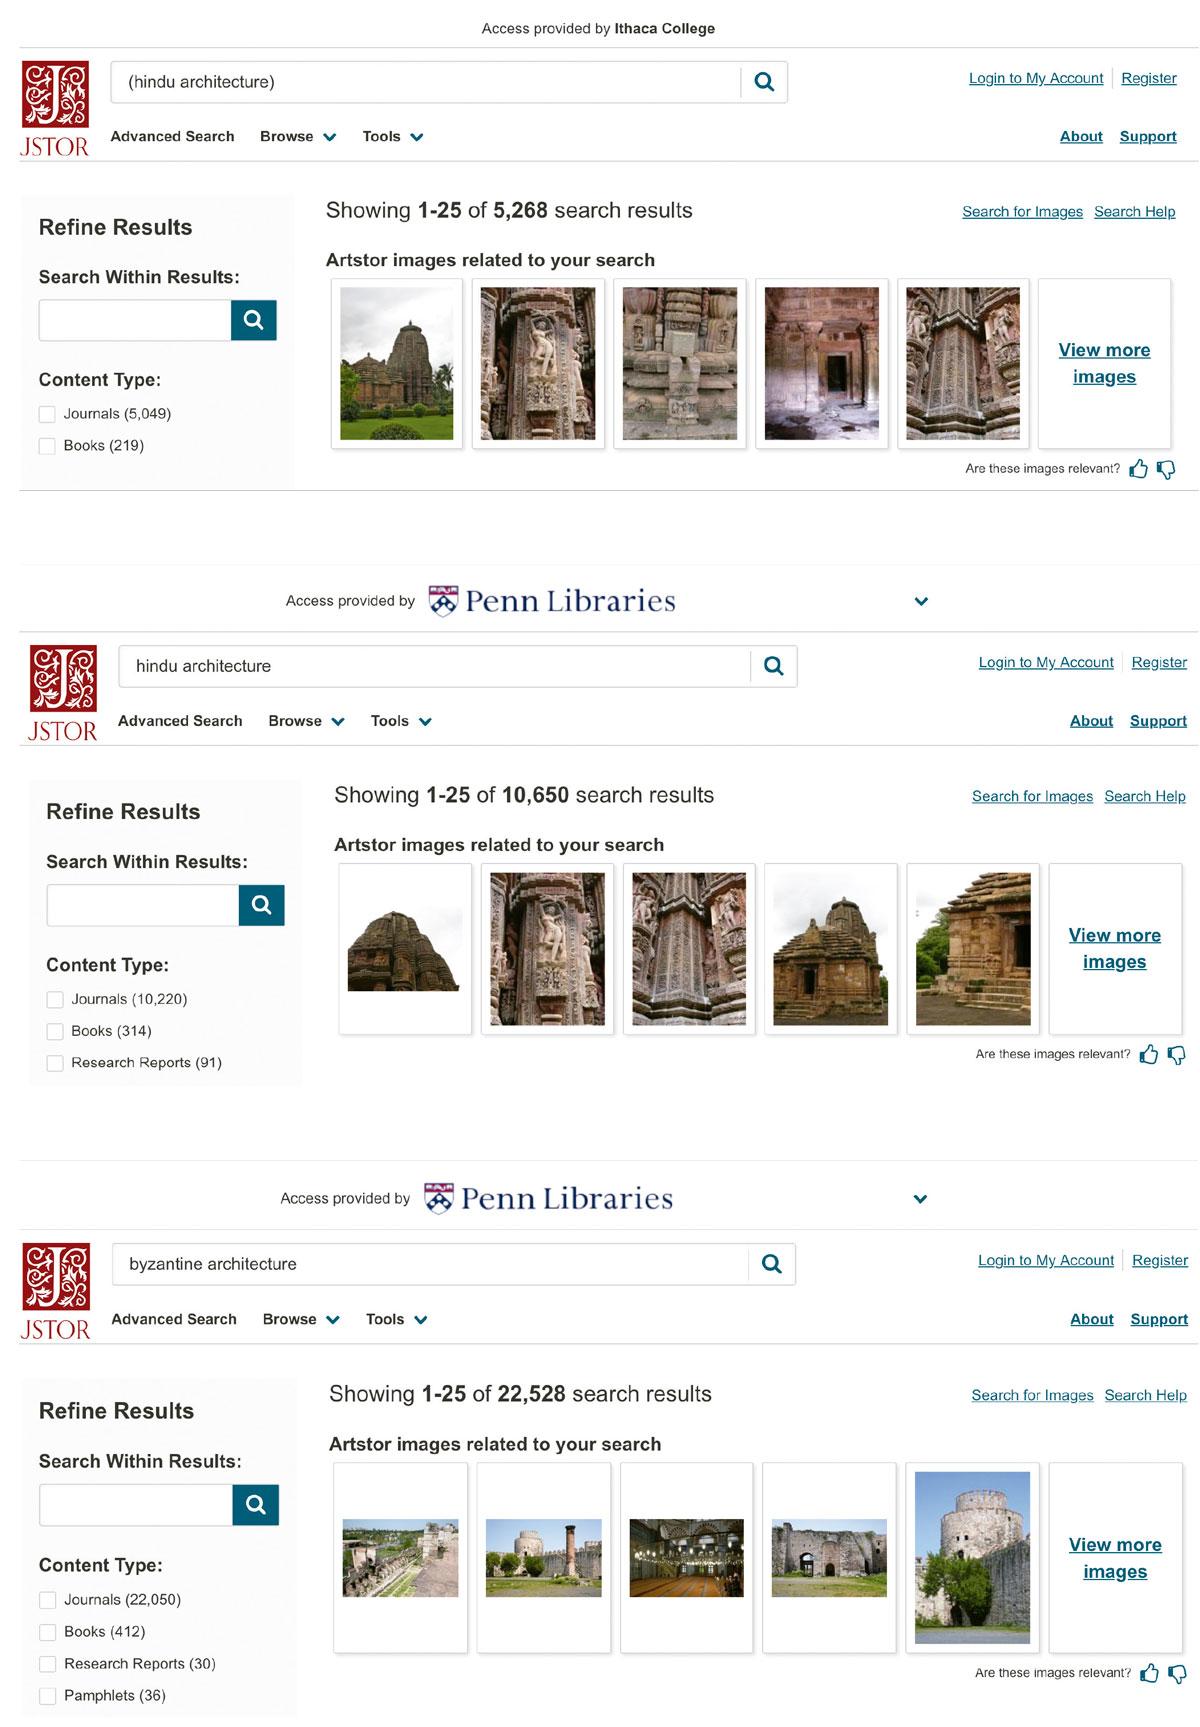 Capturas de pantalla de la pagina web JSTOR Ithaka College.